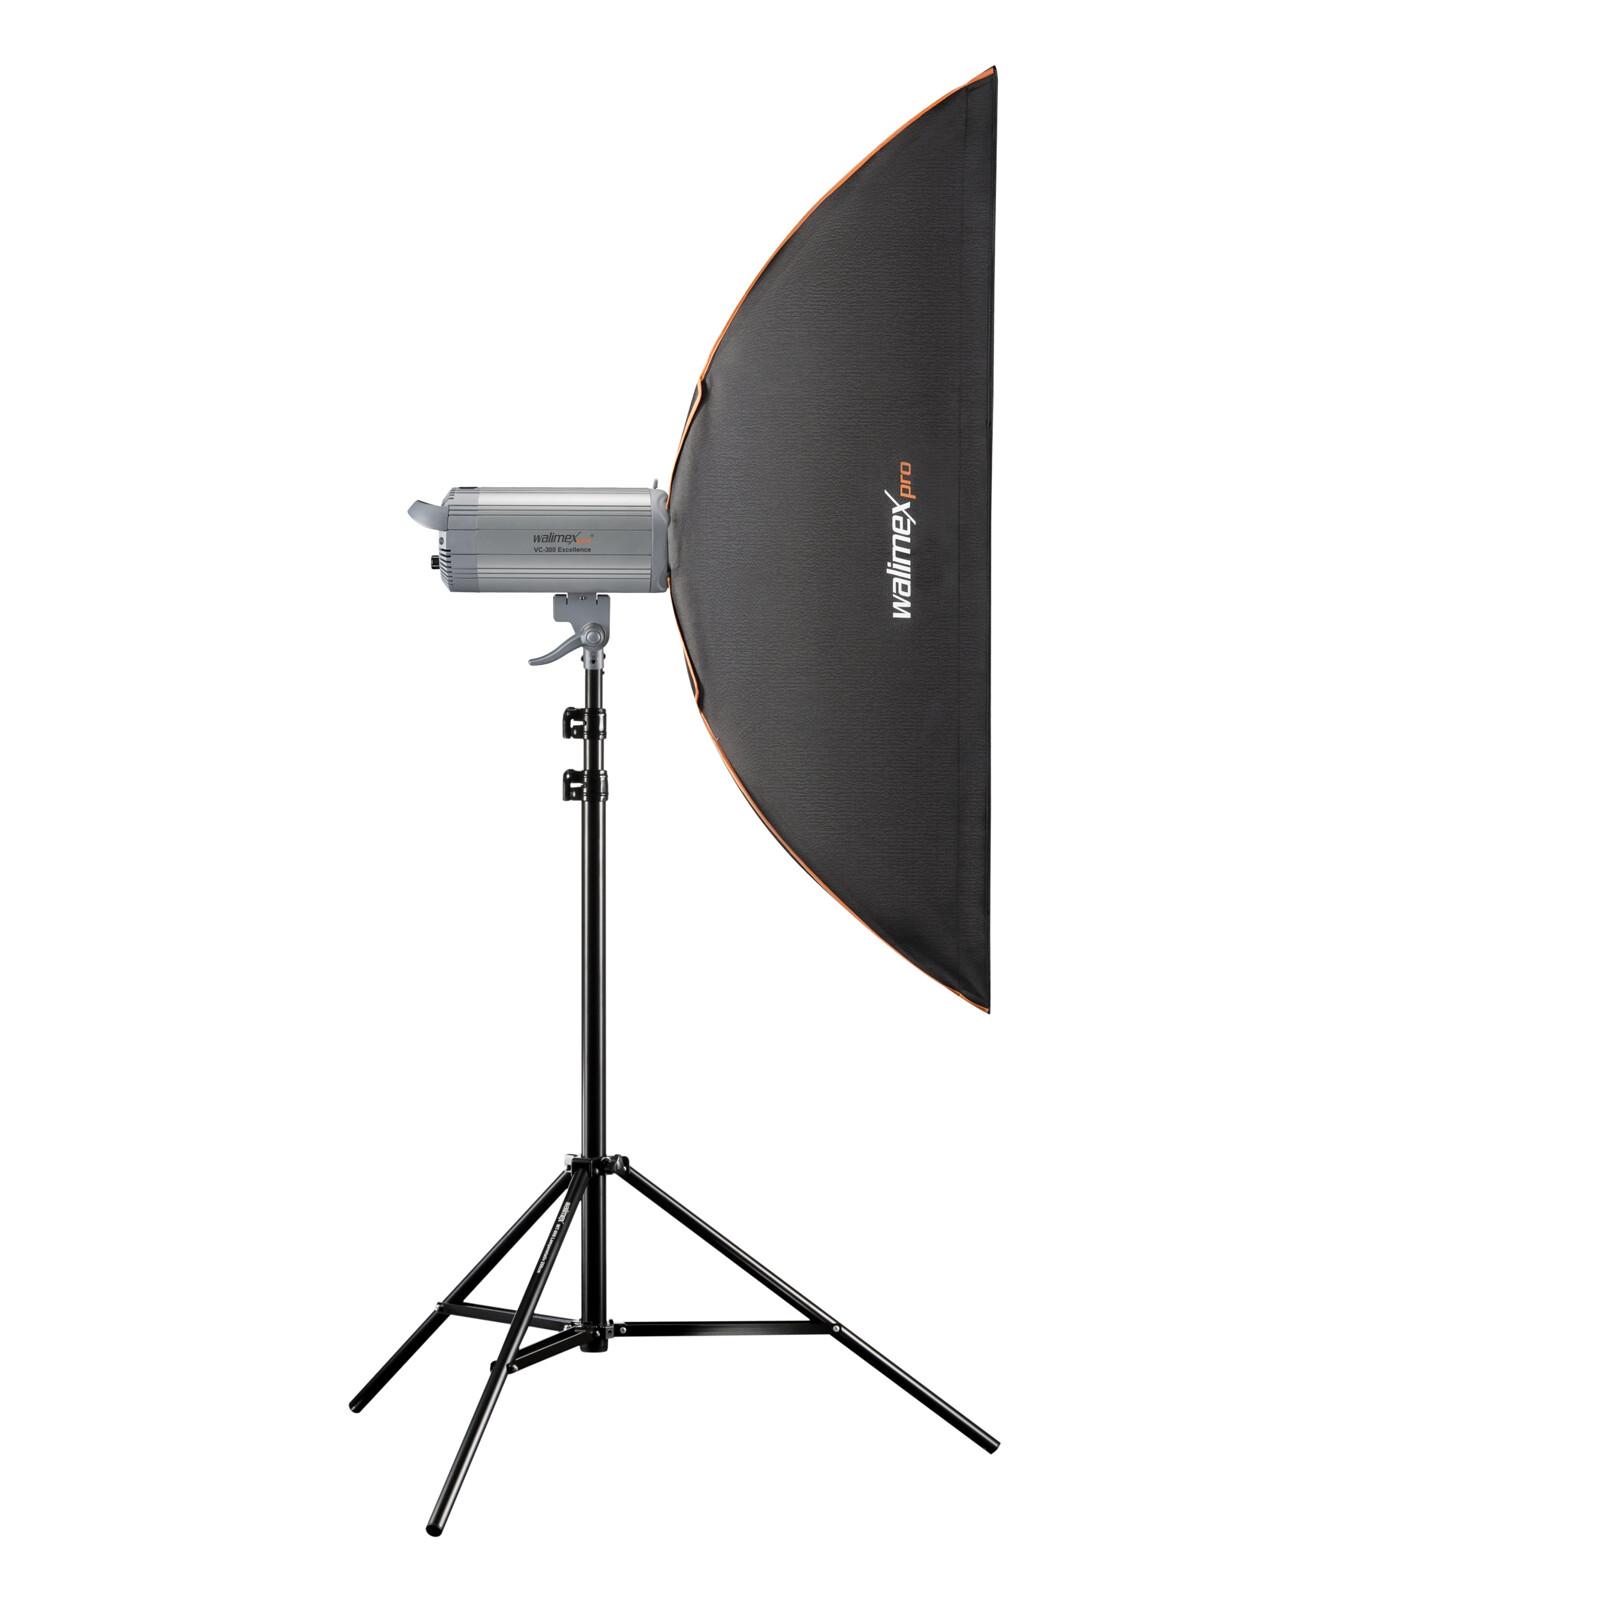 walimex pro VC Excellence Studioset Advance 300